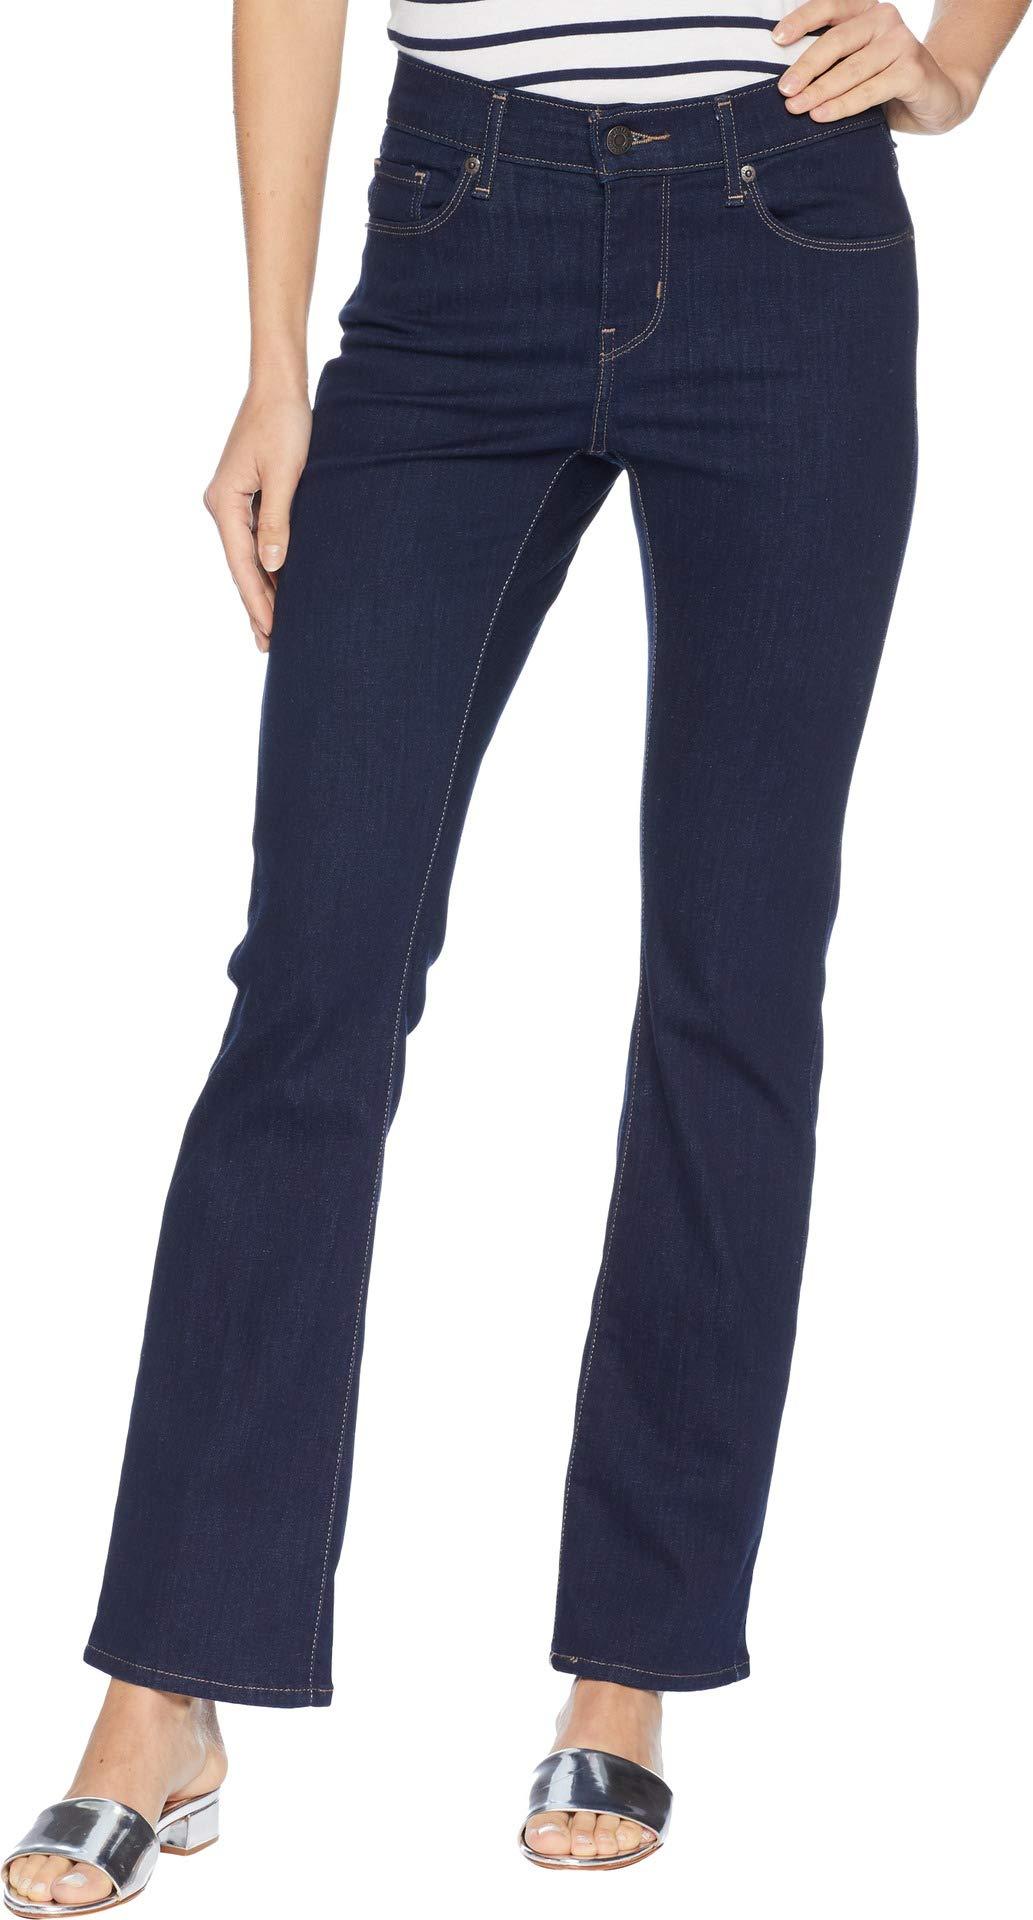 Levi's Women's Curvy Bootcut Jeans, Smooth Dark